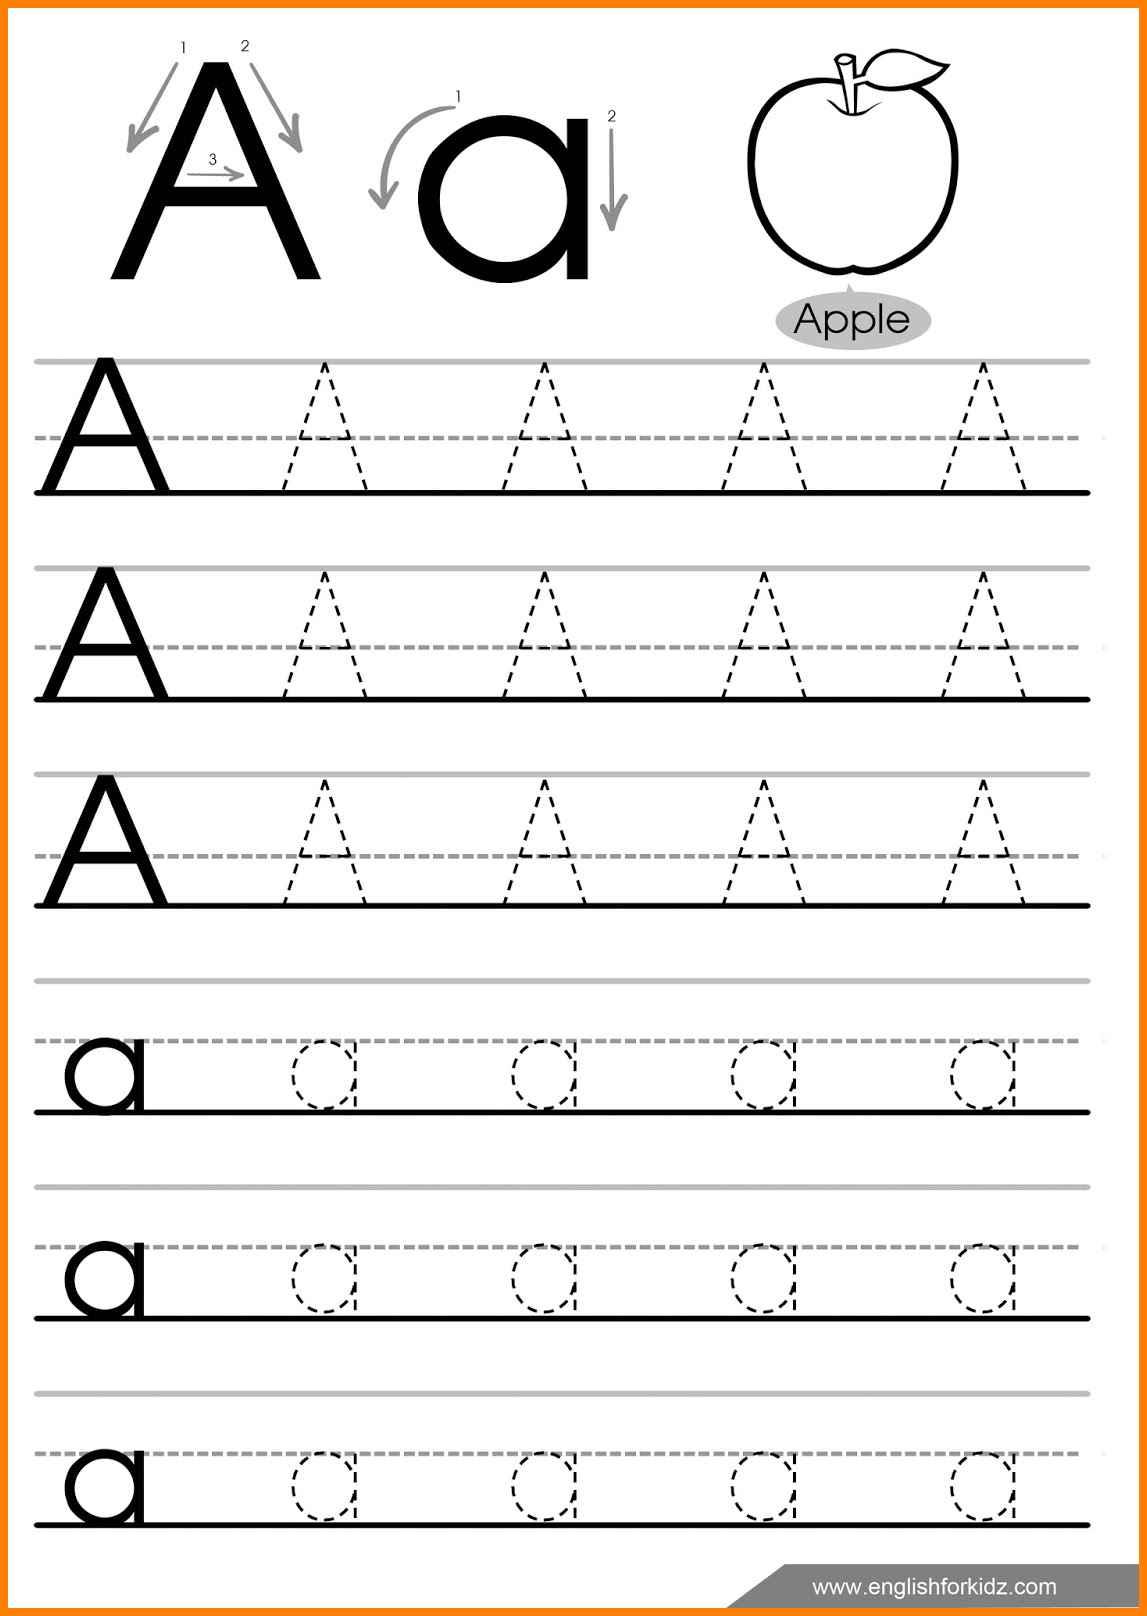 Letter I Tracing Worksheets The Best Worksheets Image Collection